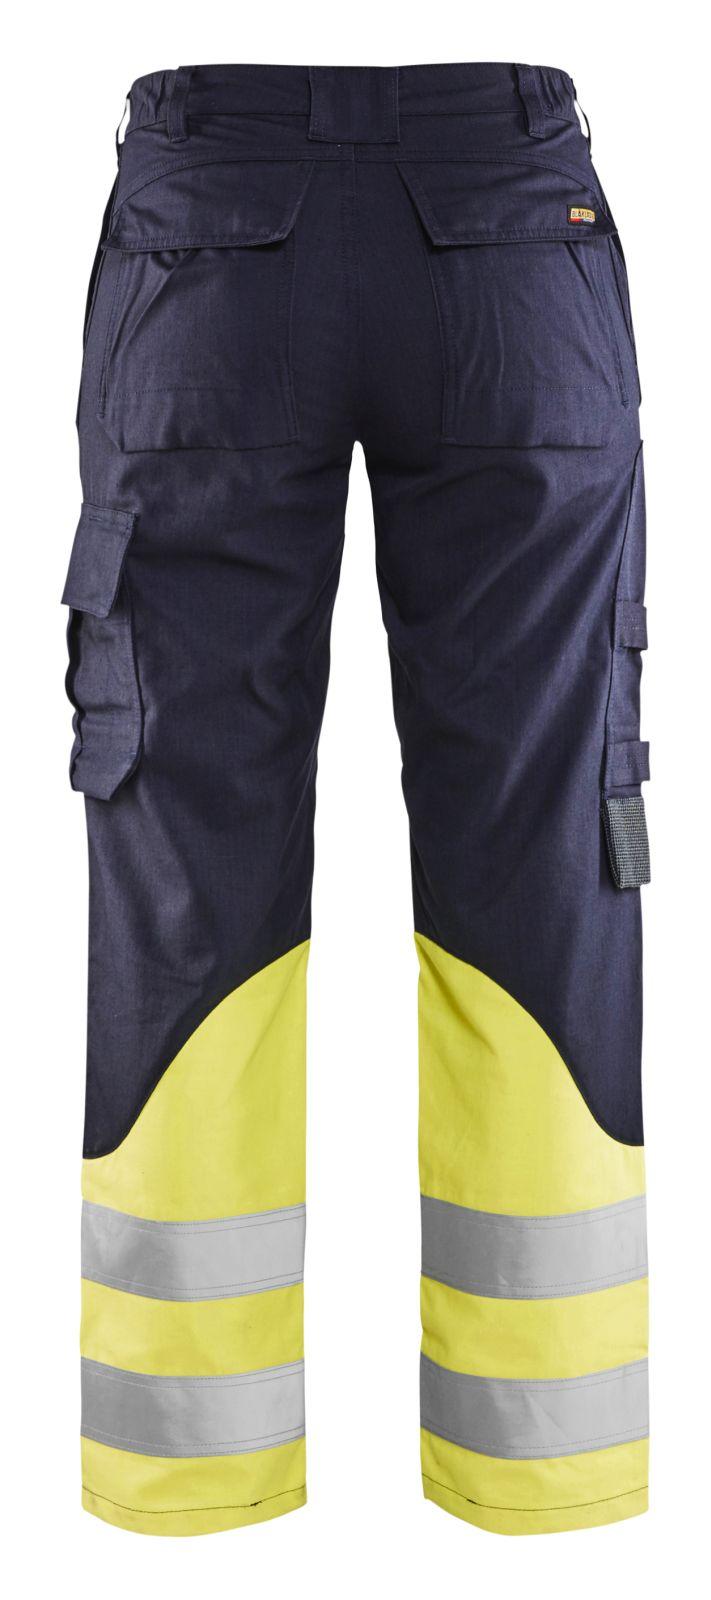 Blaklader Broeken 71881512 Multinorm marineblauw-fluo geel(8933)